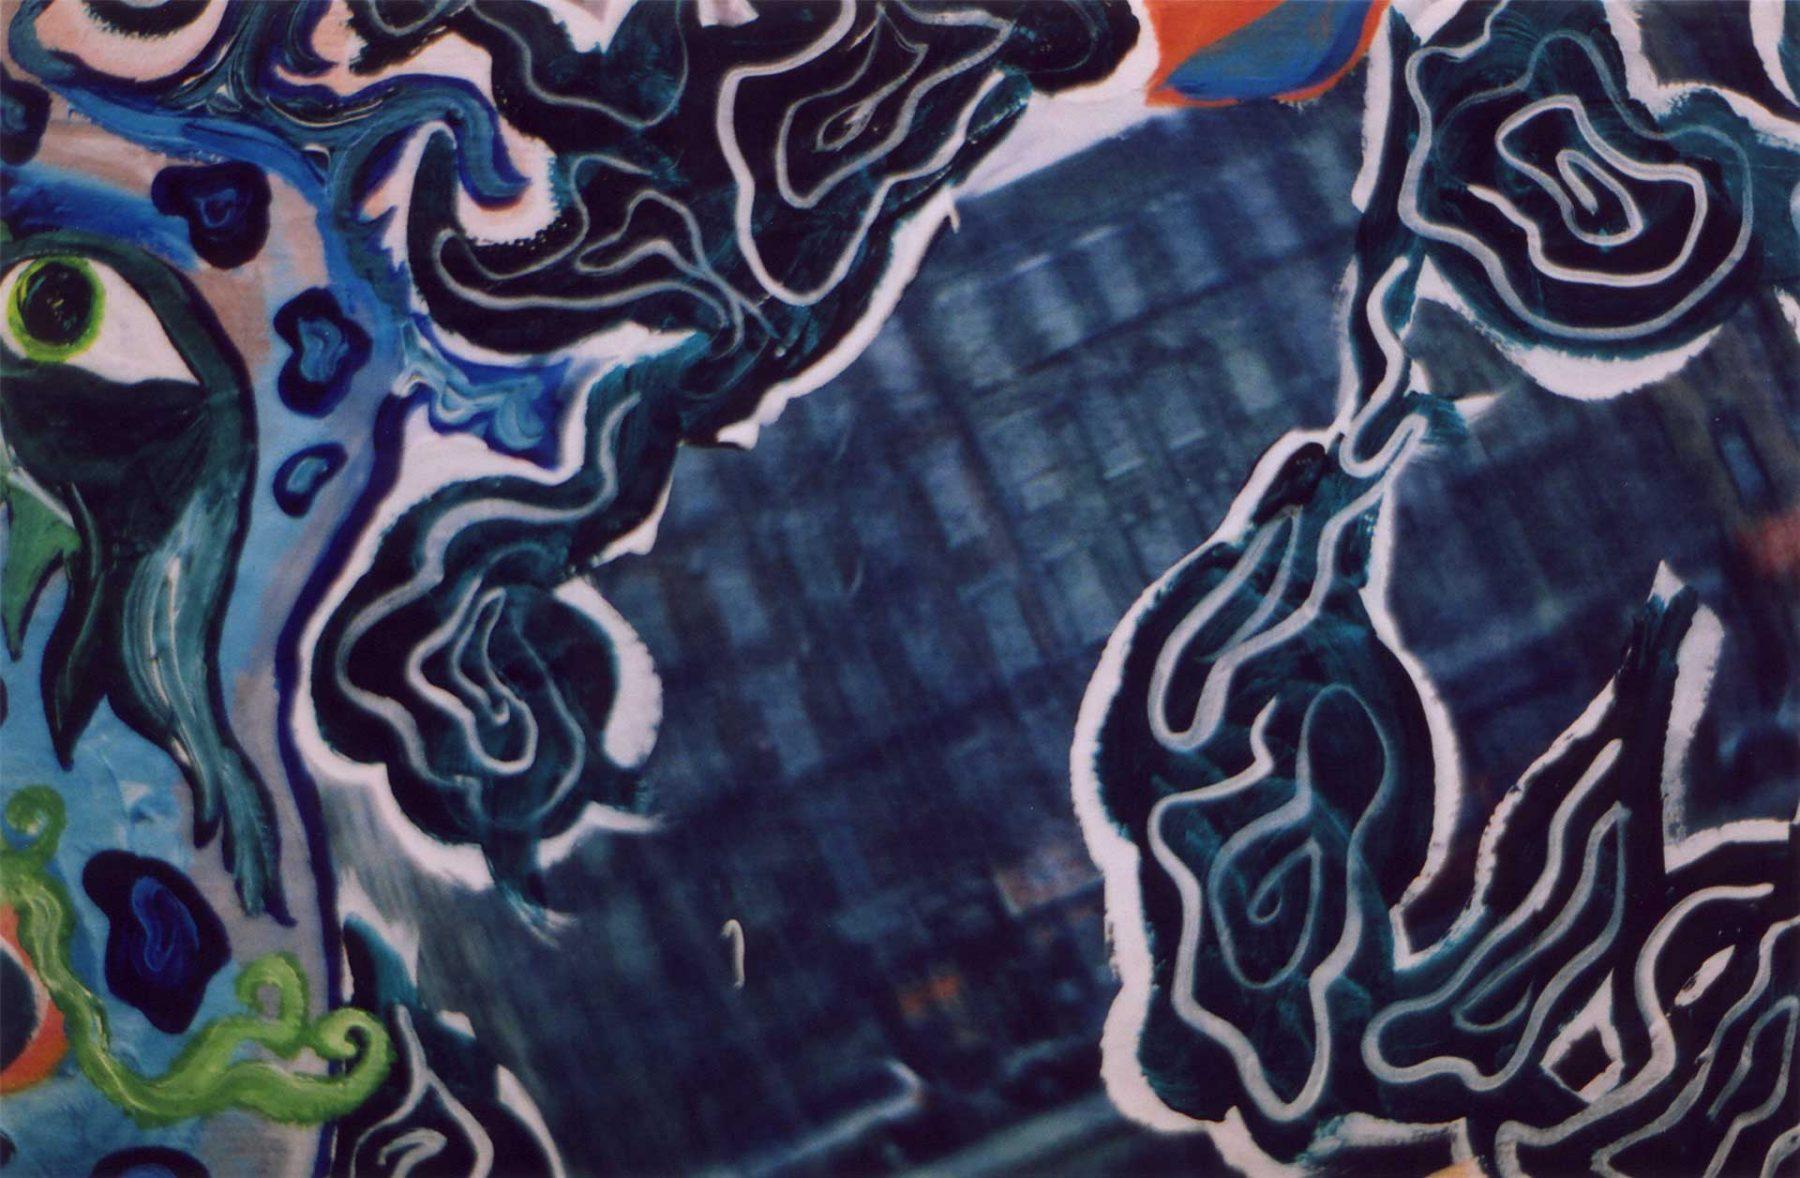 Drifting with the Dragon (Homage to Hamzanama) (2003) detail 2